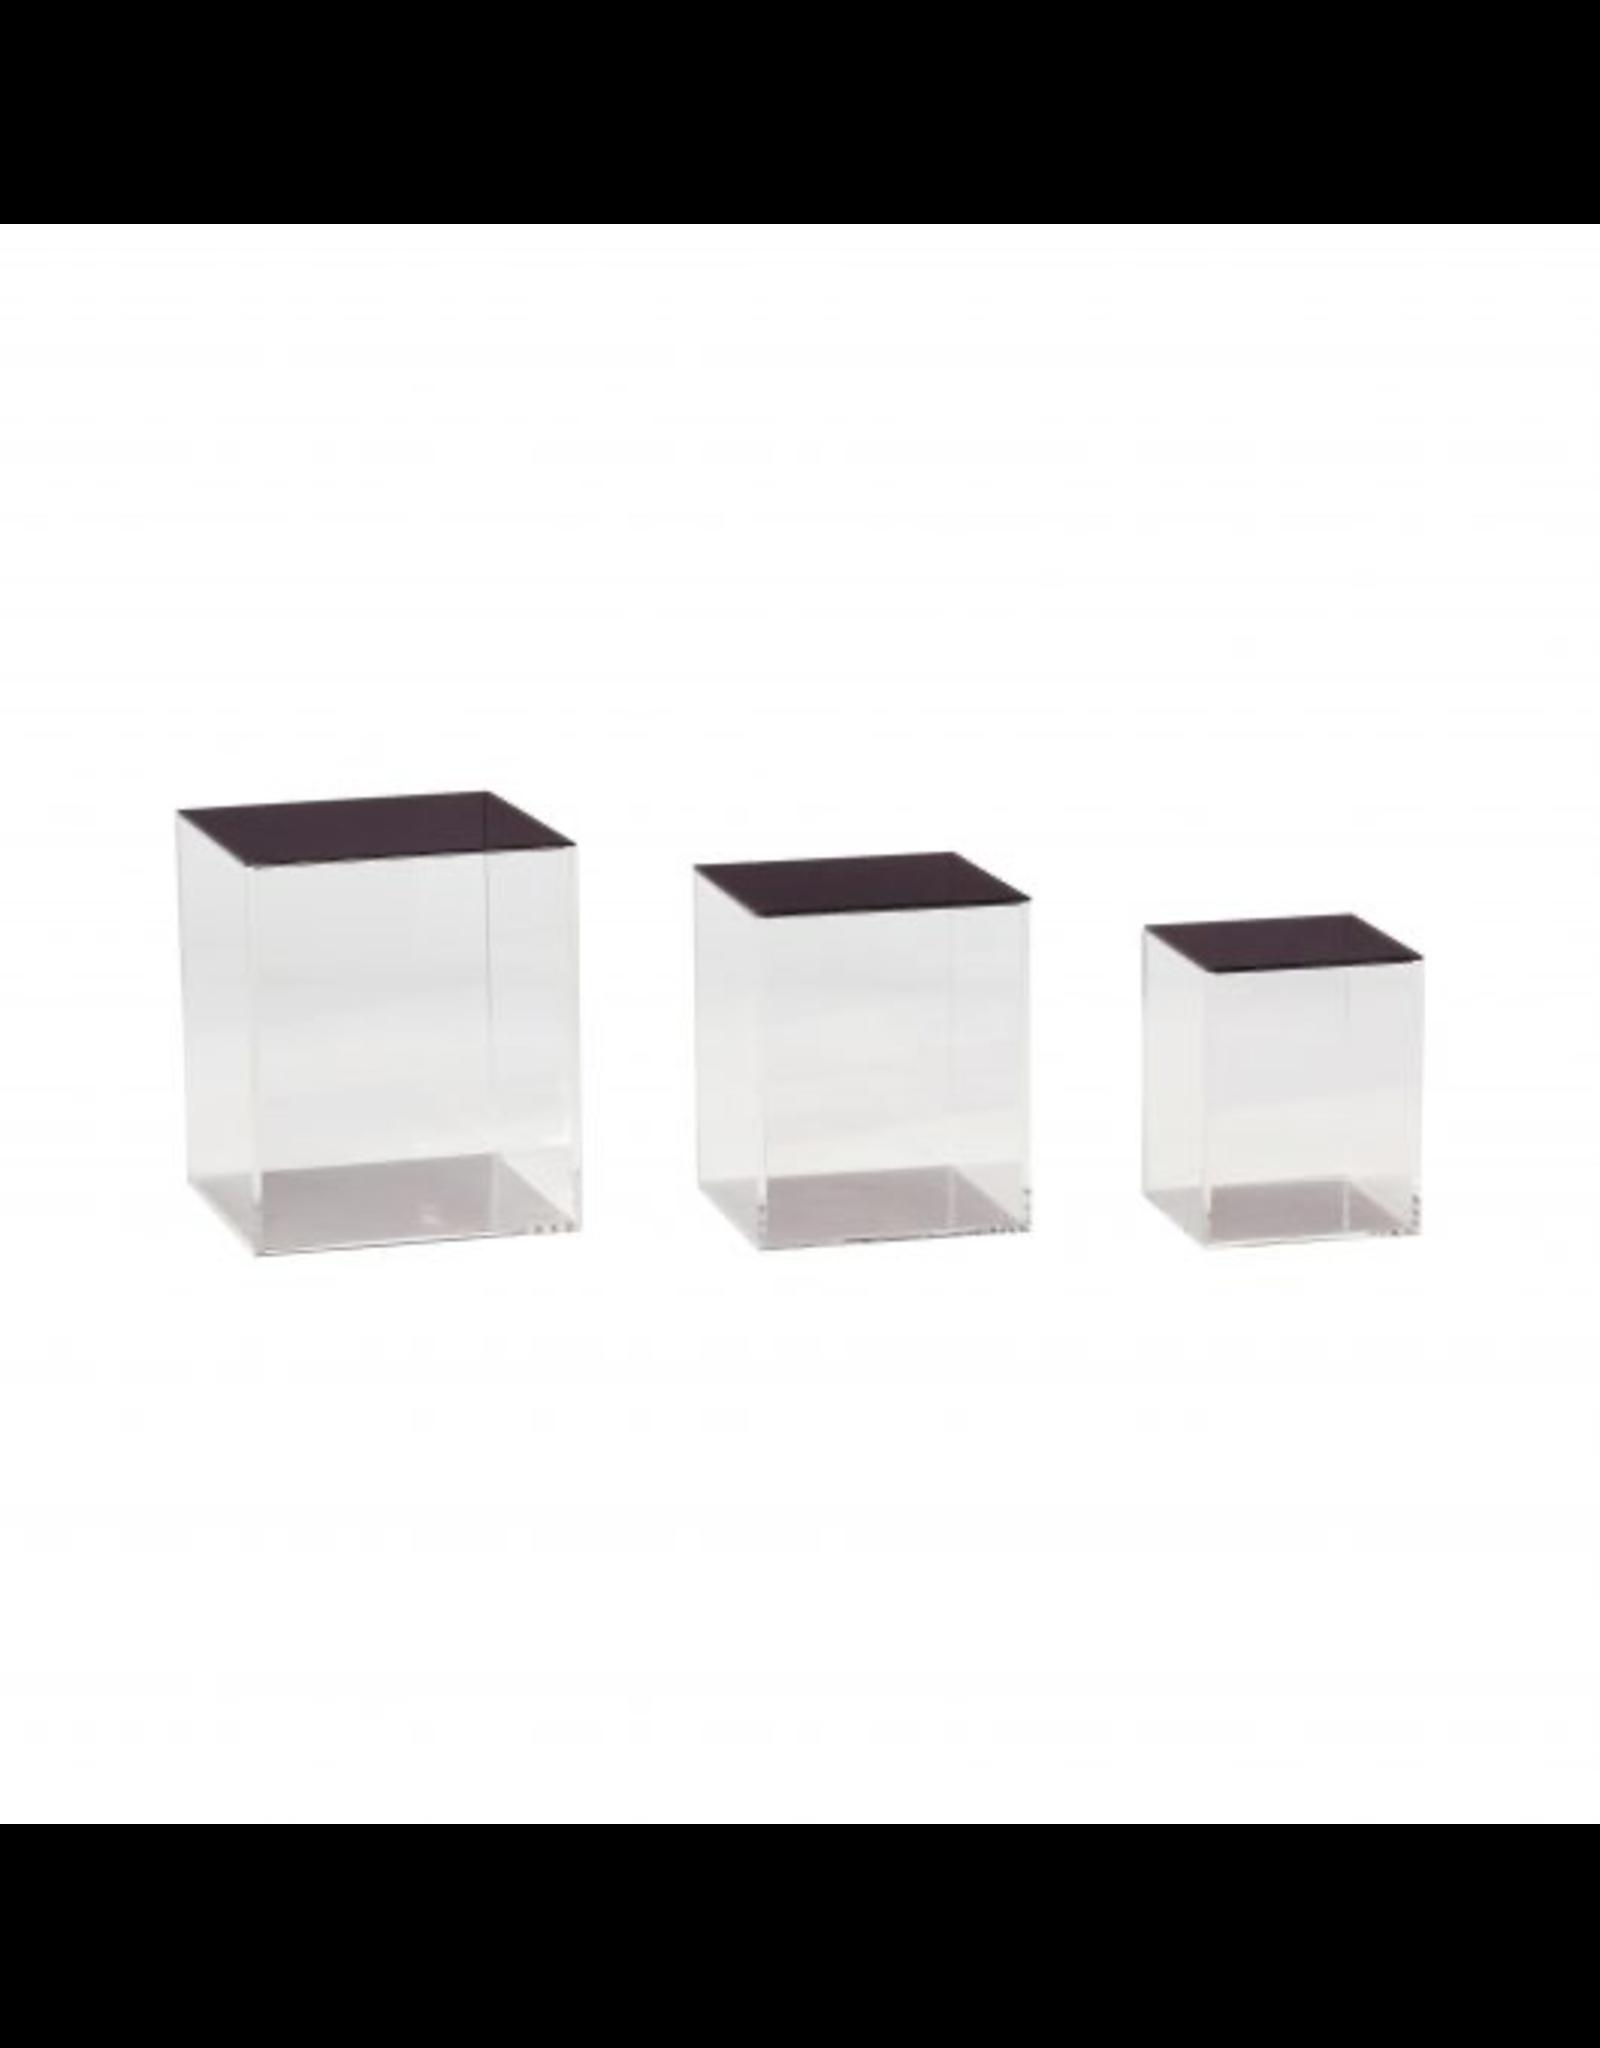 Hubsch A/S BOX W/LID, ACRYLIC, TRANSPARANT/BLACK, S/3